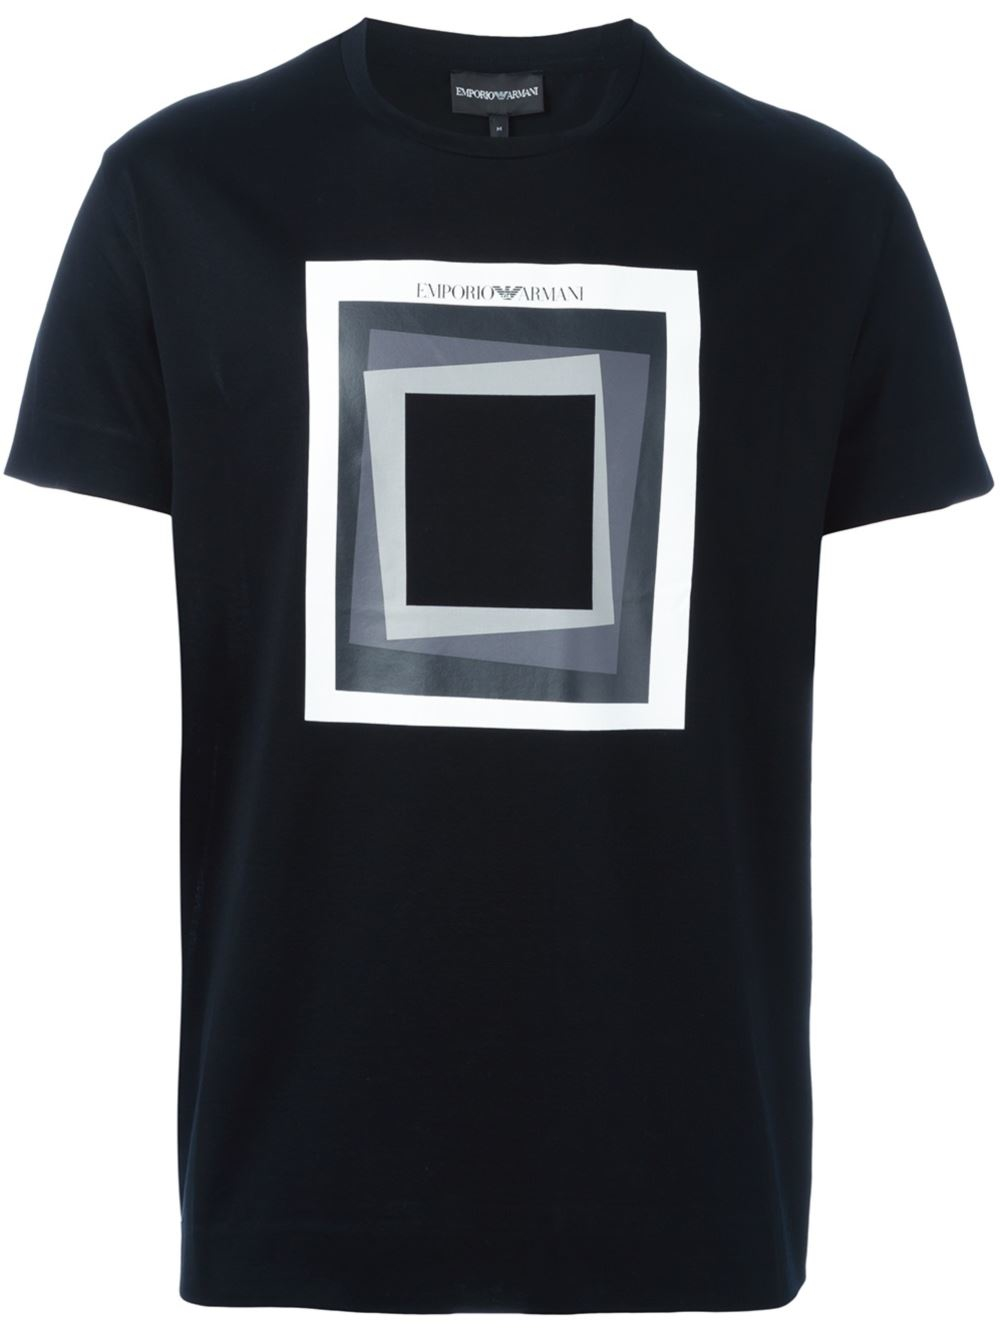 Lyst Emporio Armani Square Print T Shirt In Black For Men